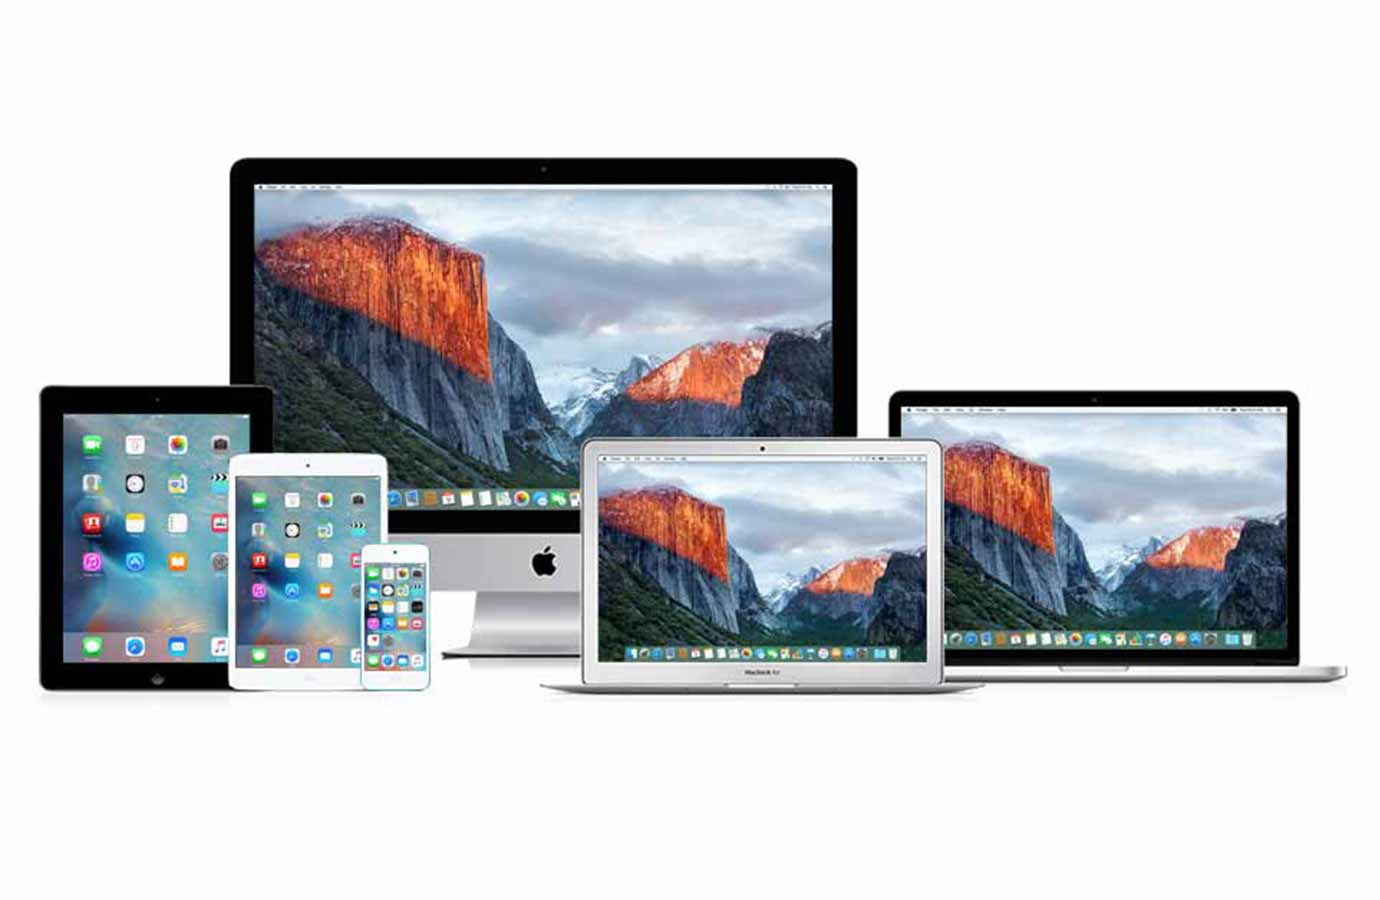 Apple、Mac整備済製品情報 (2017年9月20日)― MacBook Pro(13inch,2017)初登場